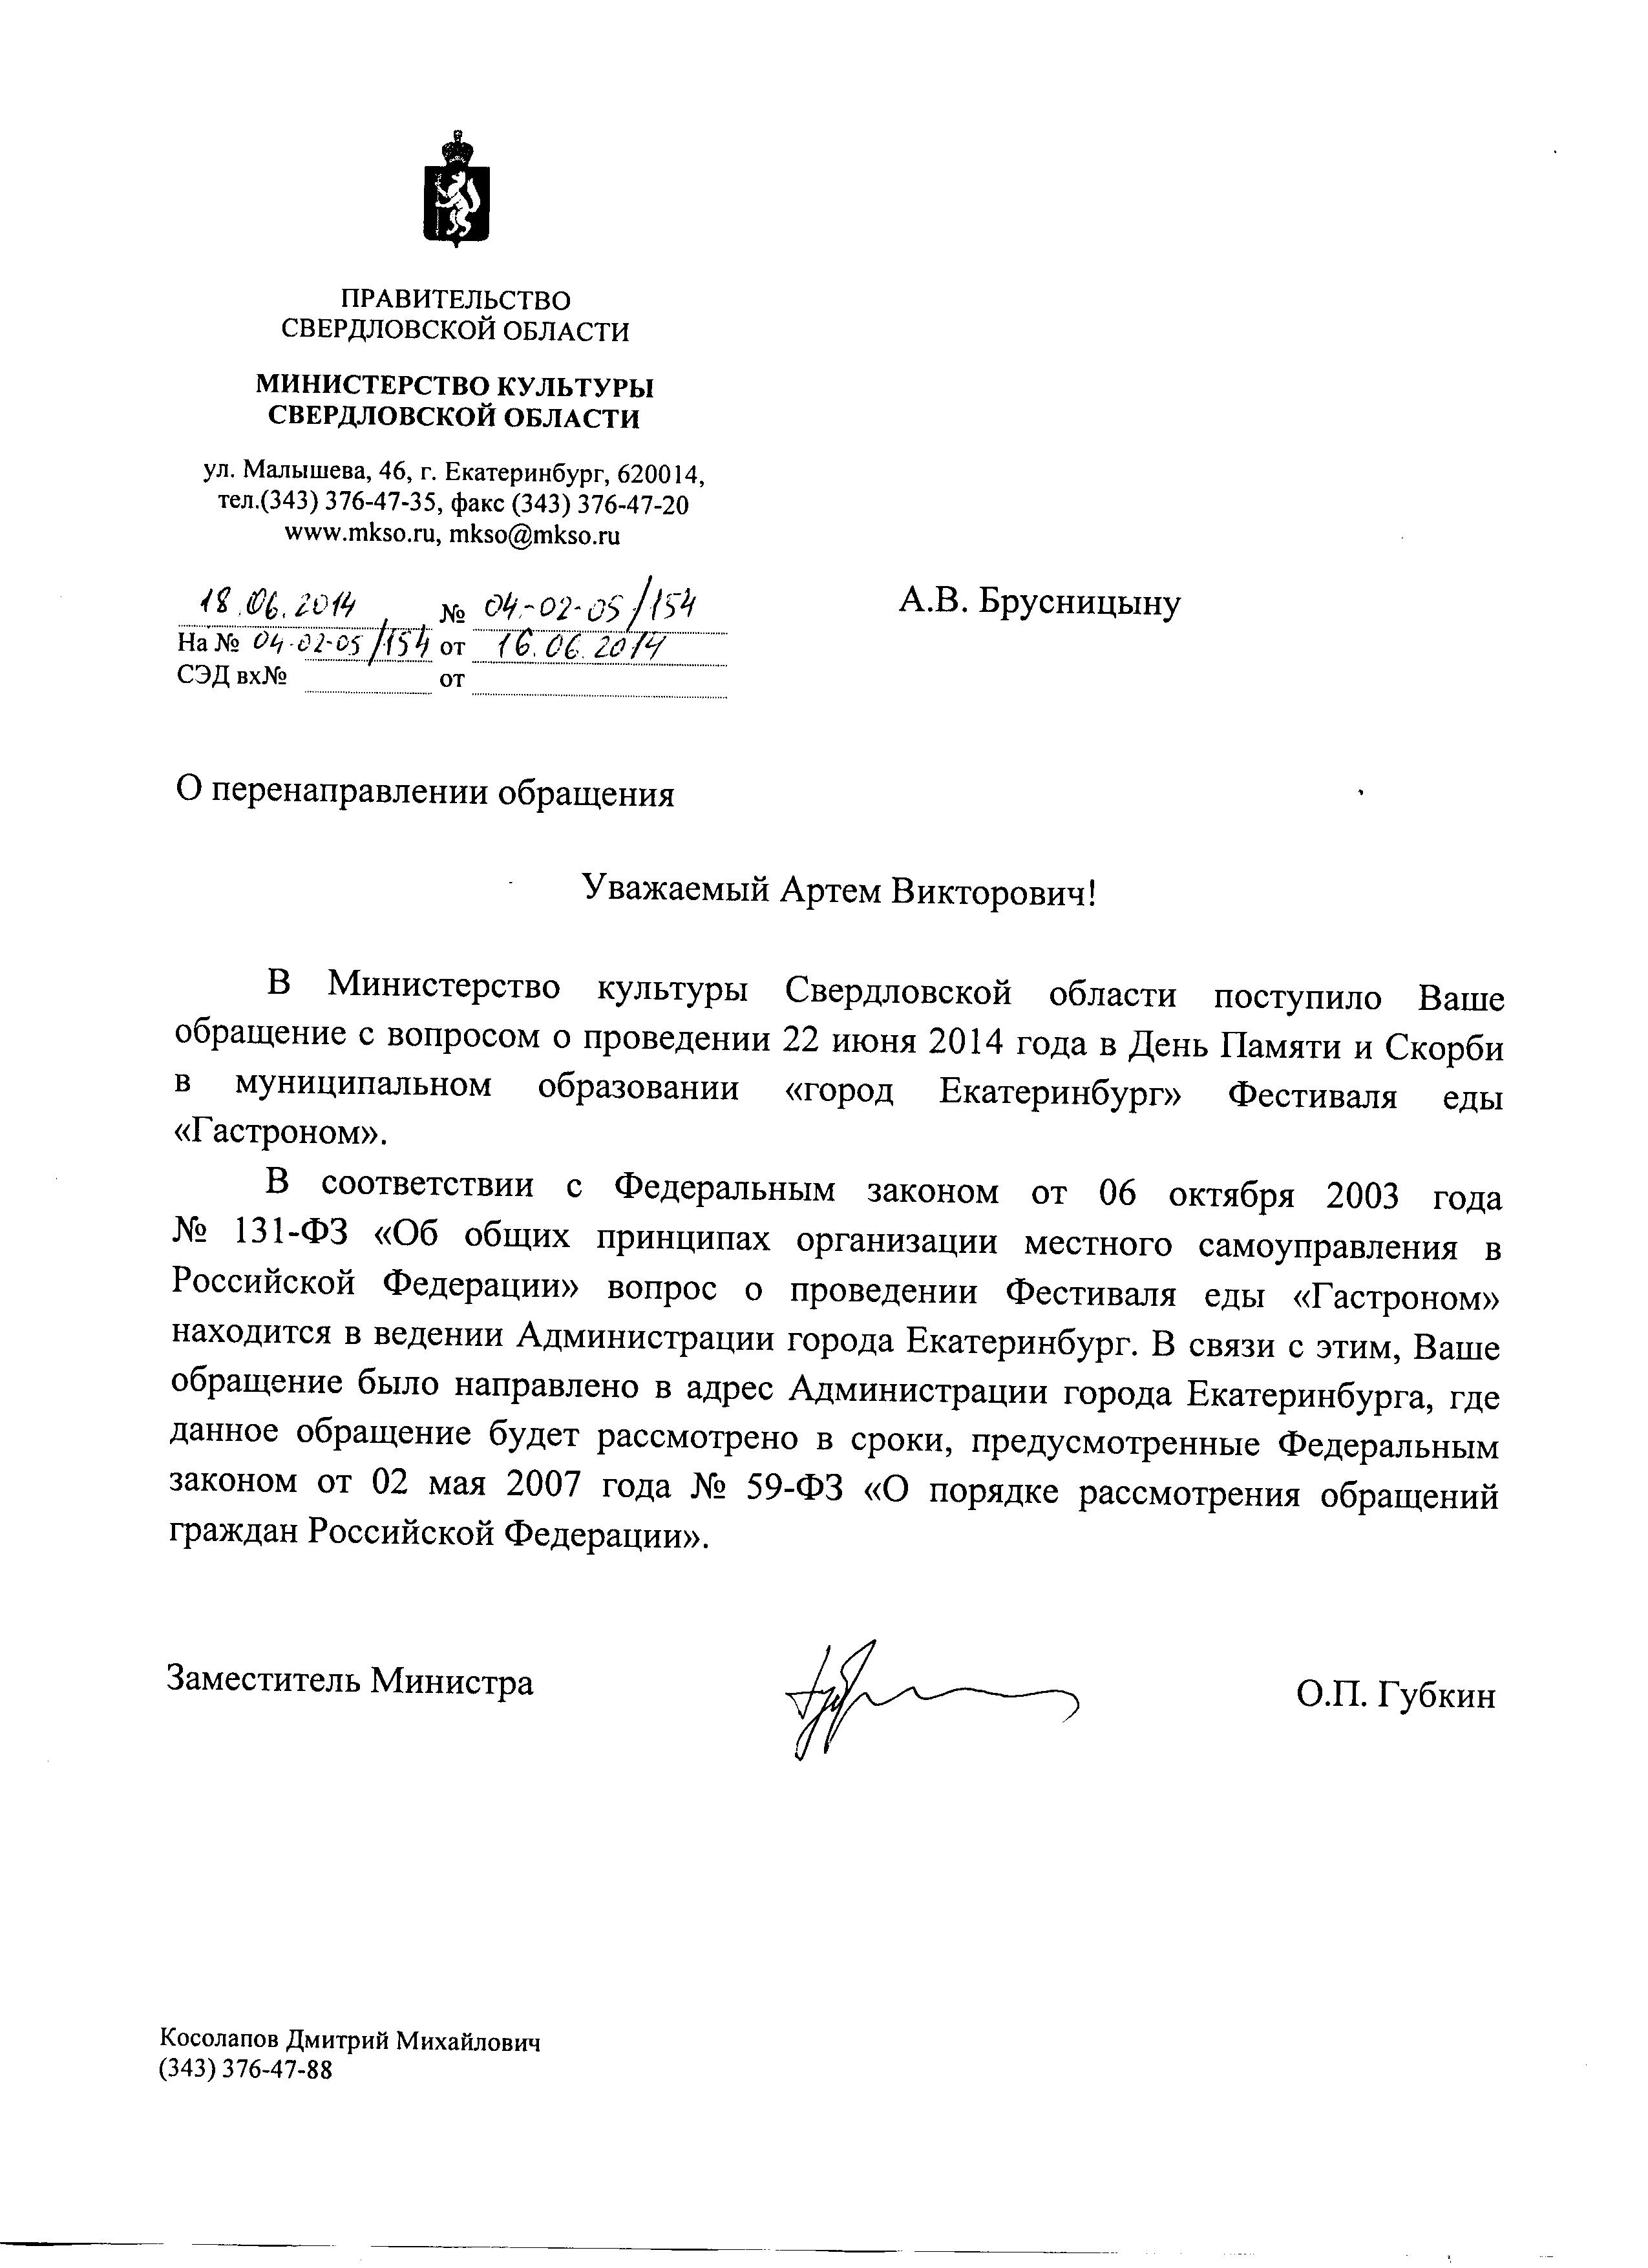 04-02-05 154 001